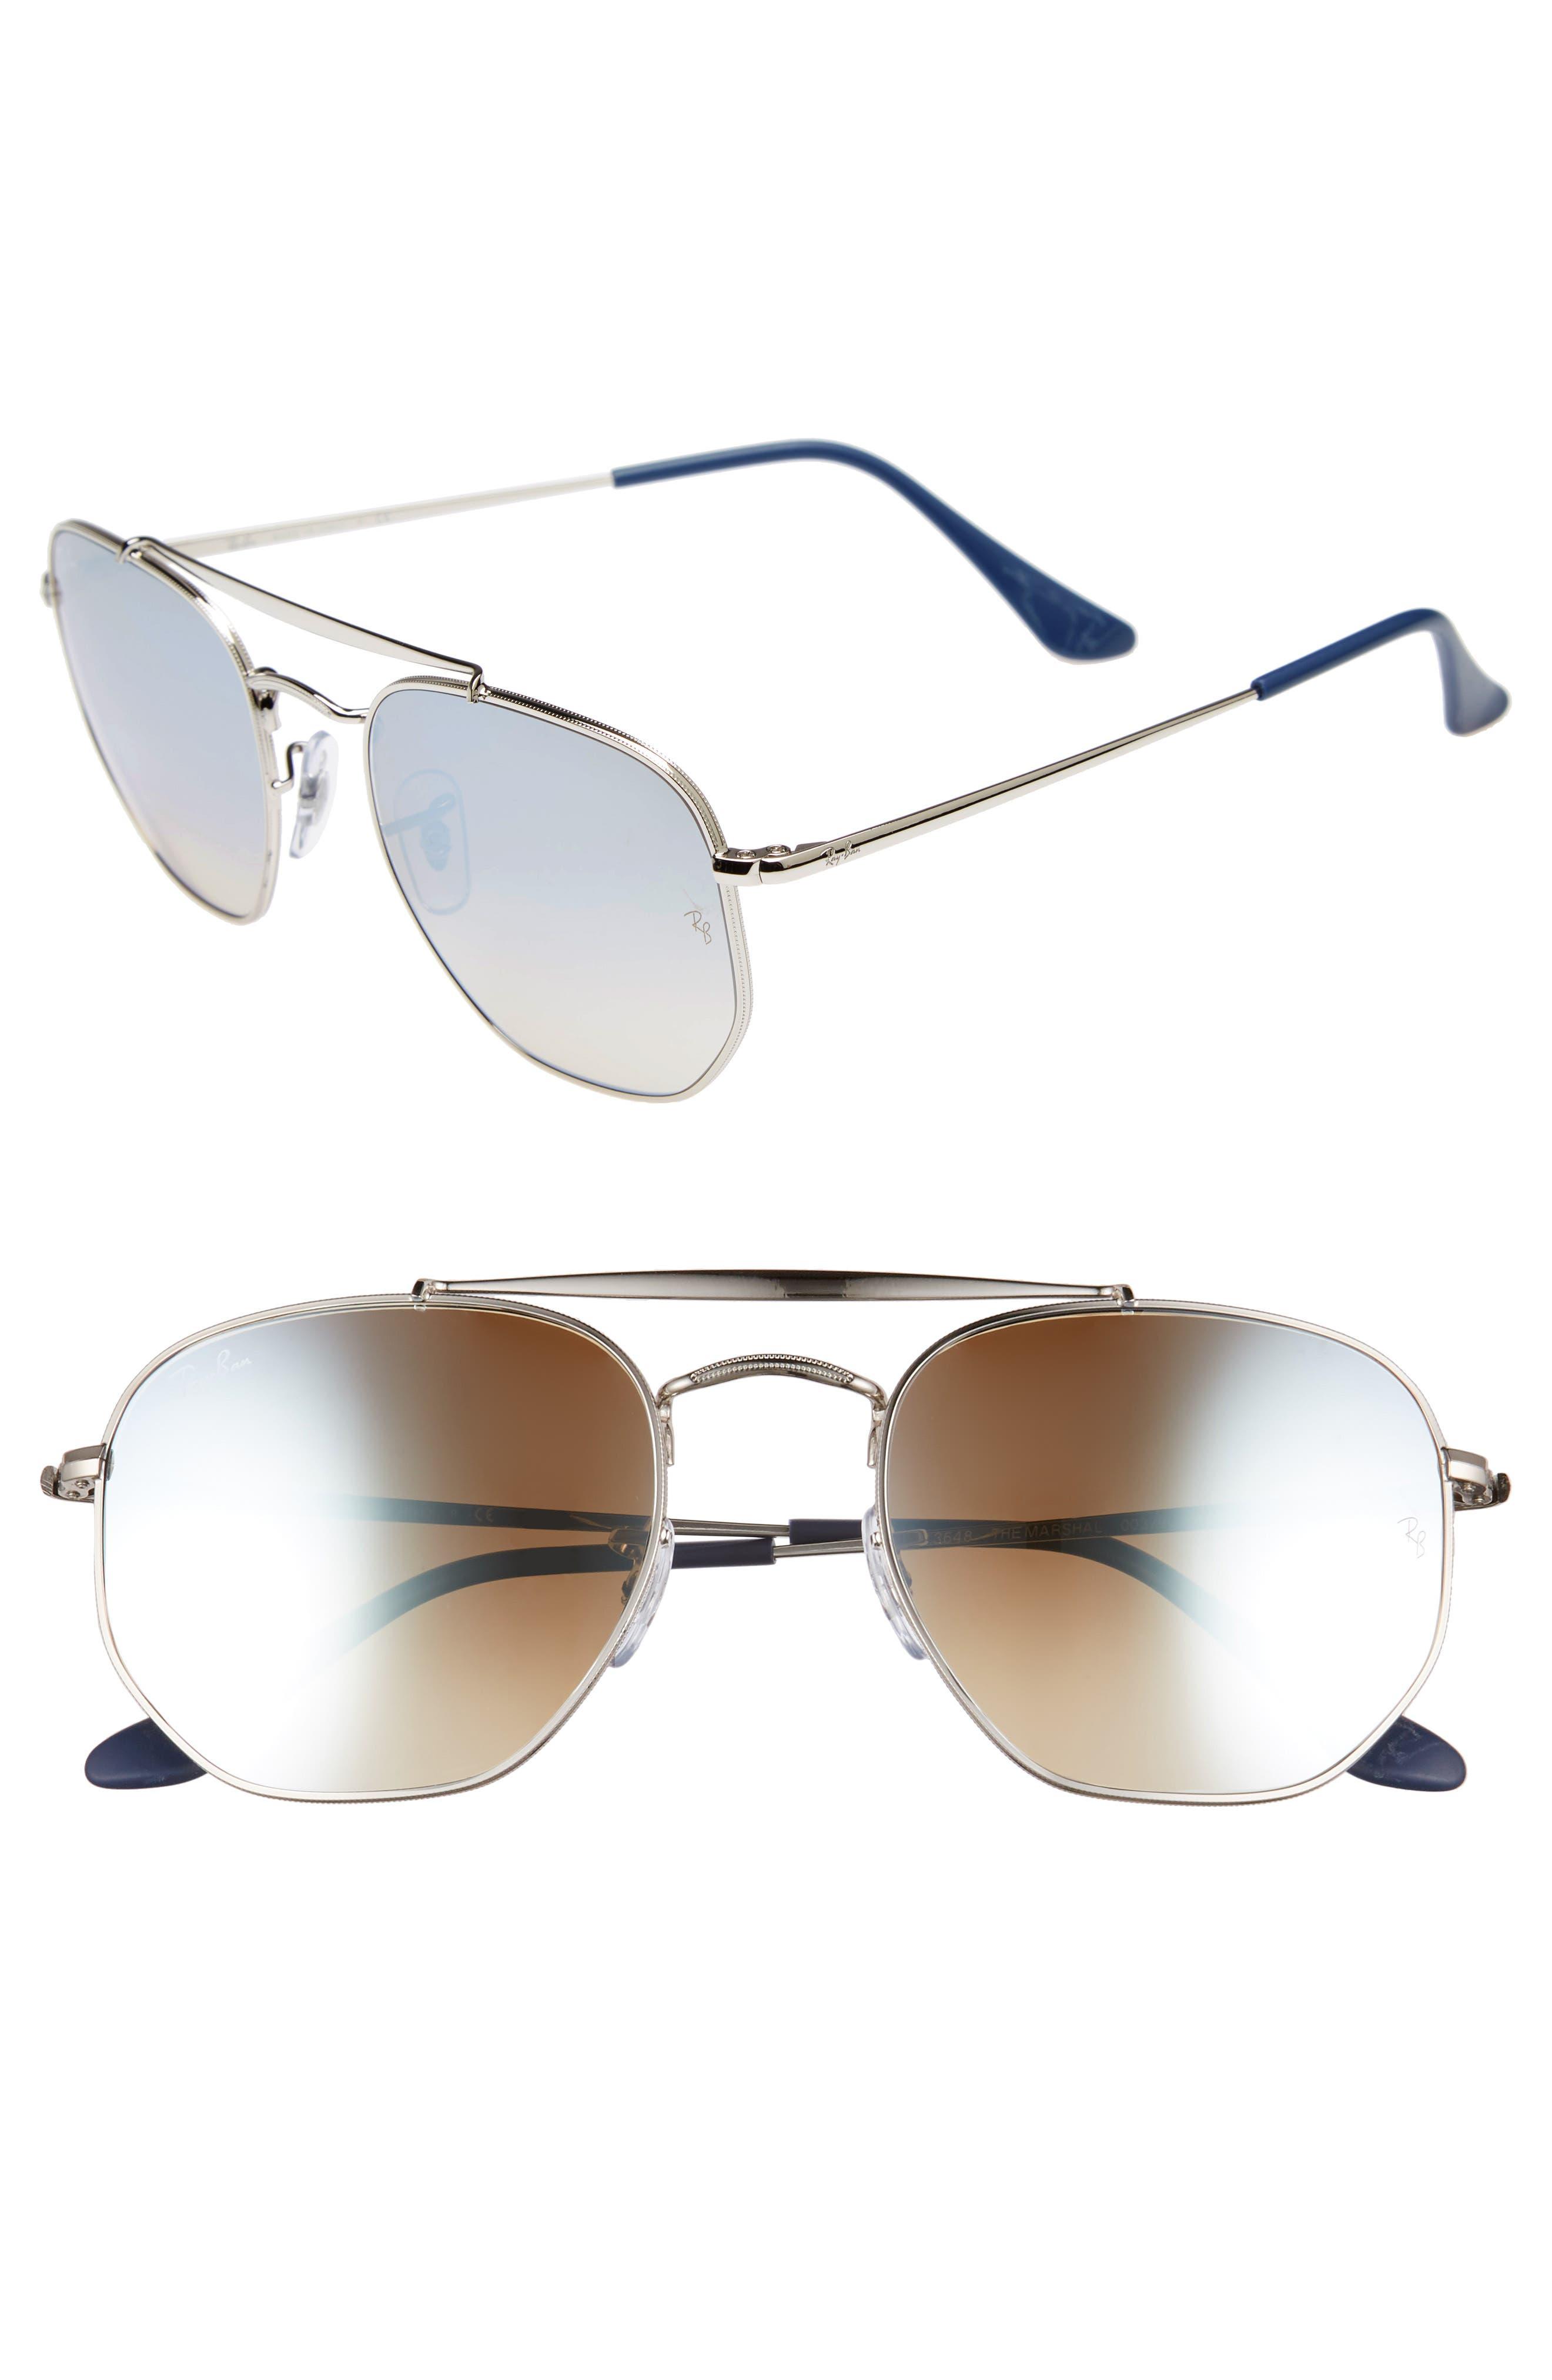 Marshal 54mm Aviator Sunglasses,                             Main thumbnail 1, color,                             SILVER